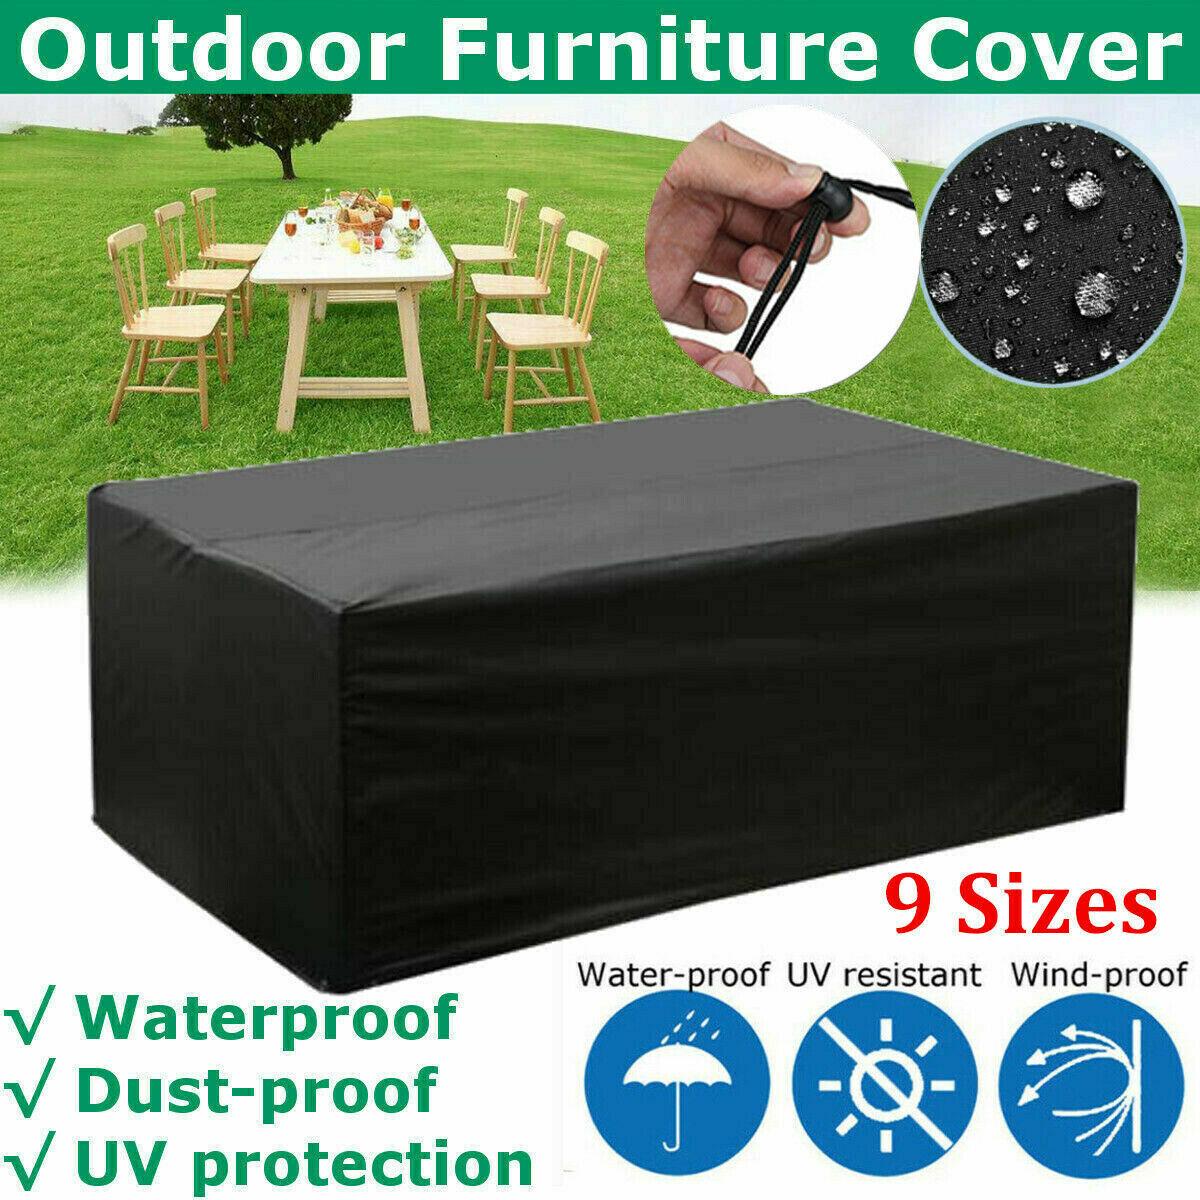 Garden Furniture - Waterproof Outdoor Furniture Cover Garden Patio Rain UV Sofa Table Protector AU